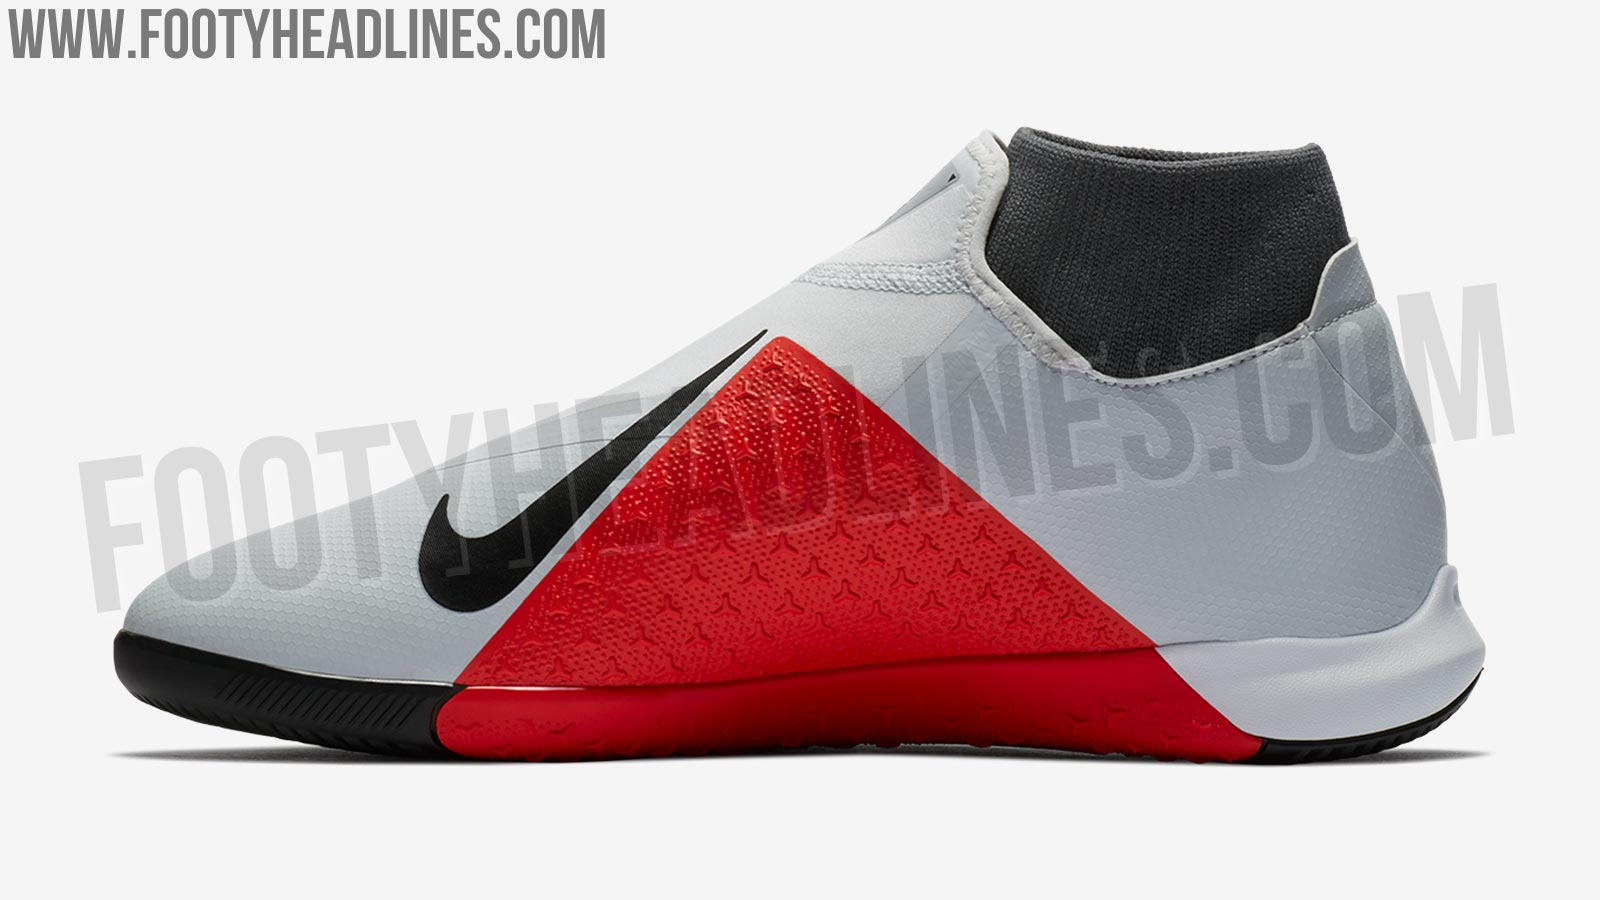 Leaked Adidas Shoes